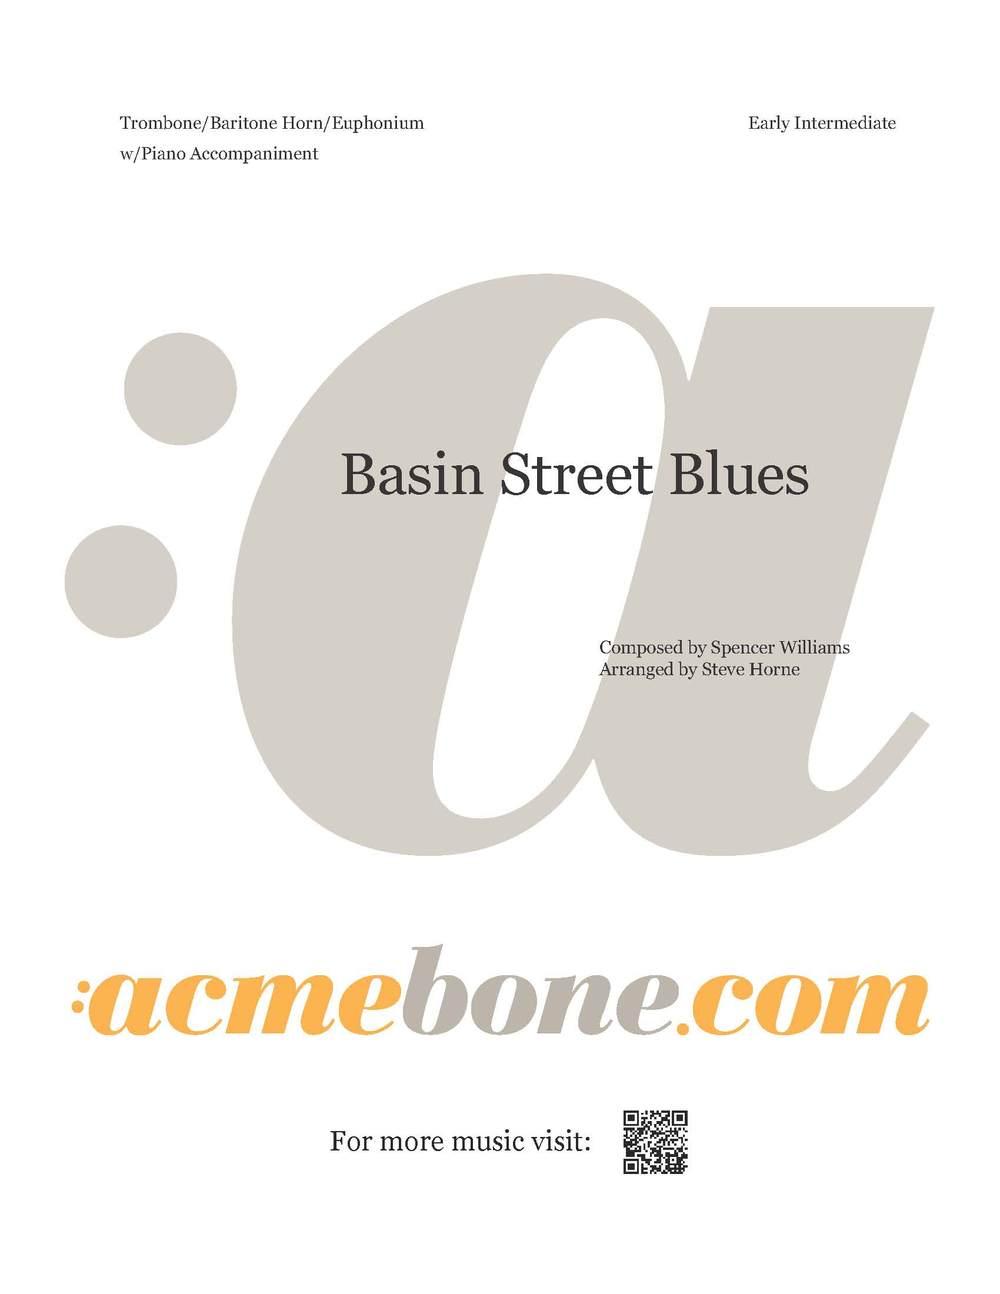 Basin Street Blues_download_from_acmebone.com_Page_1.jpg